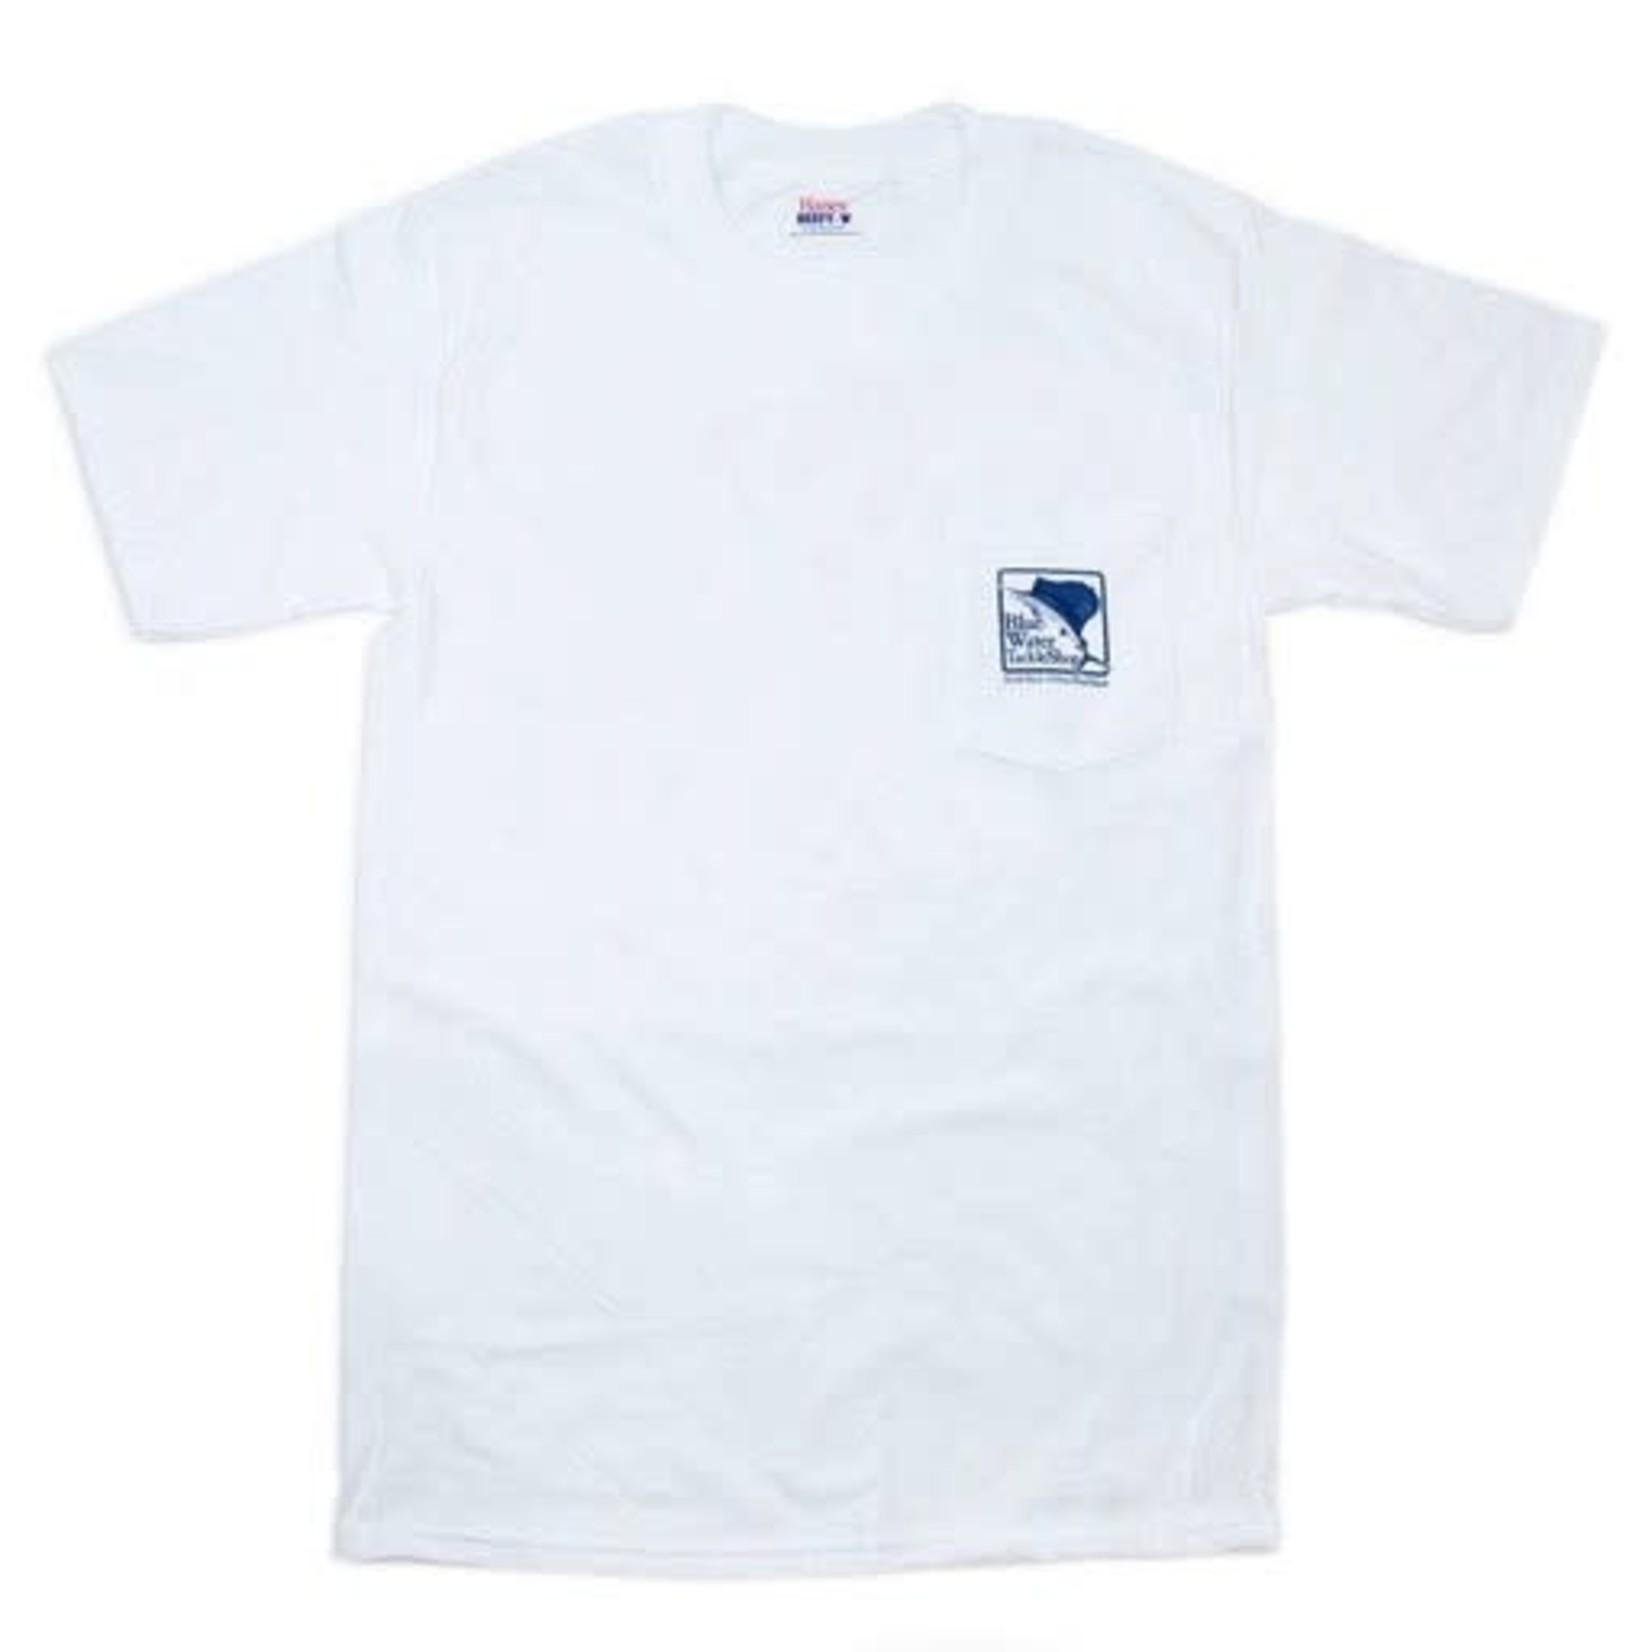 BW Pocket Sailfish 4C S/S White